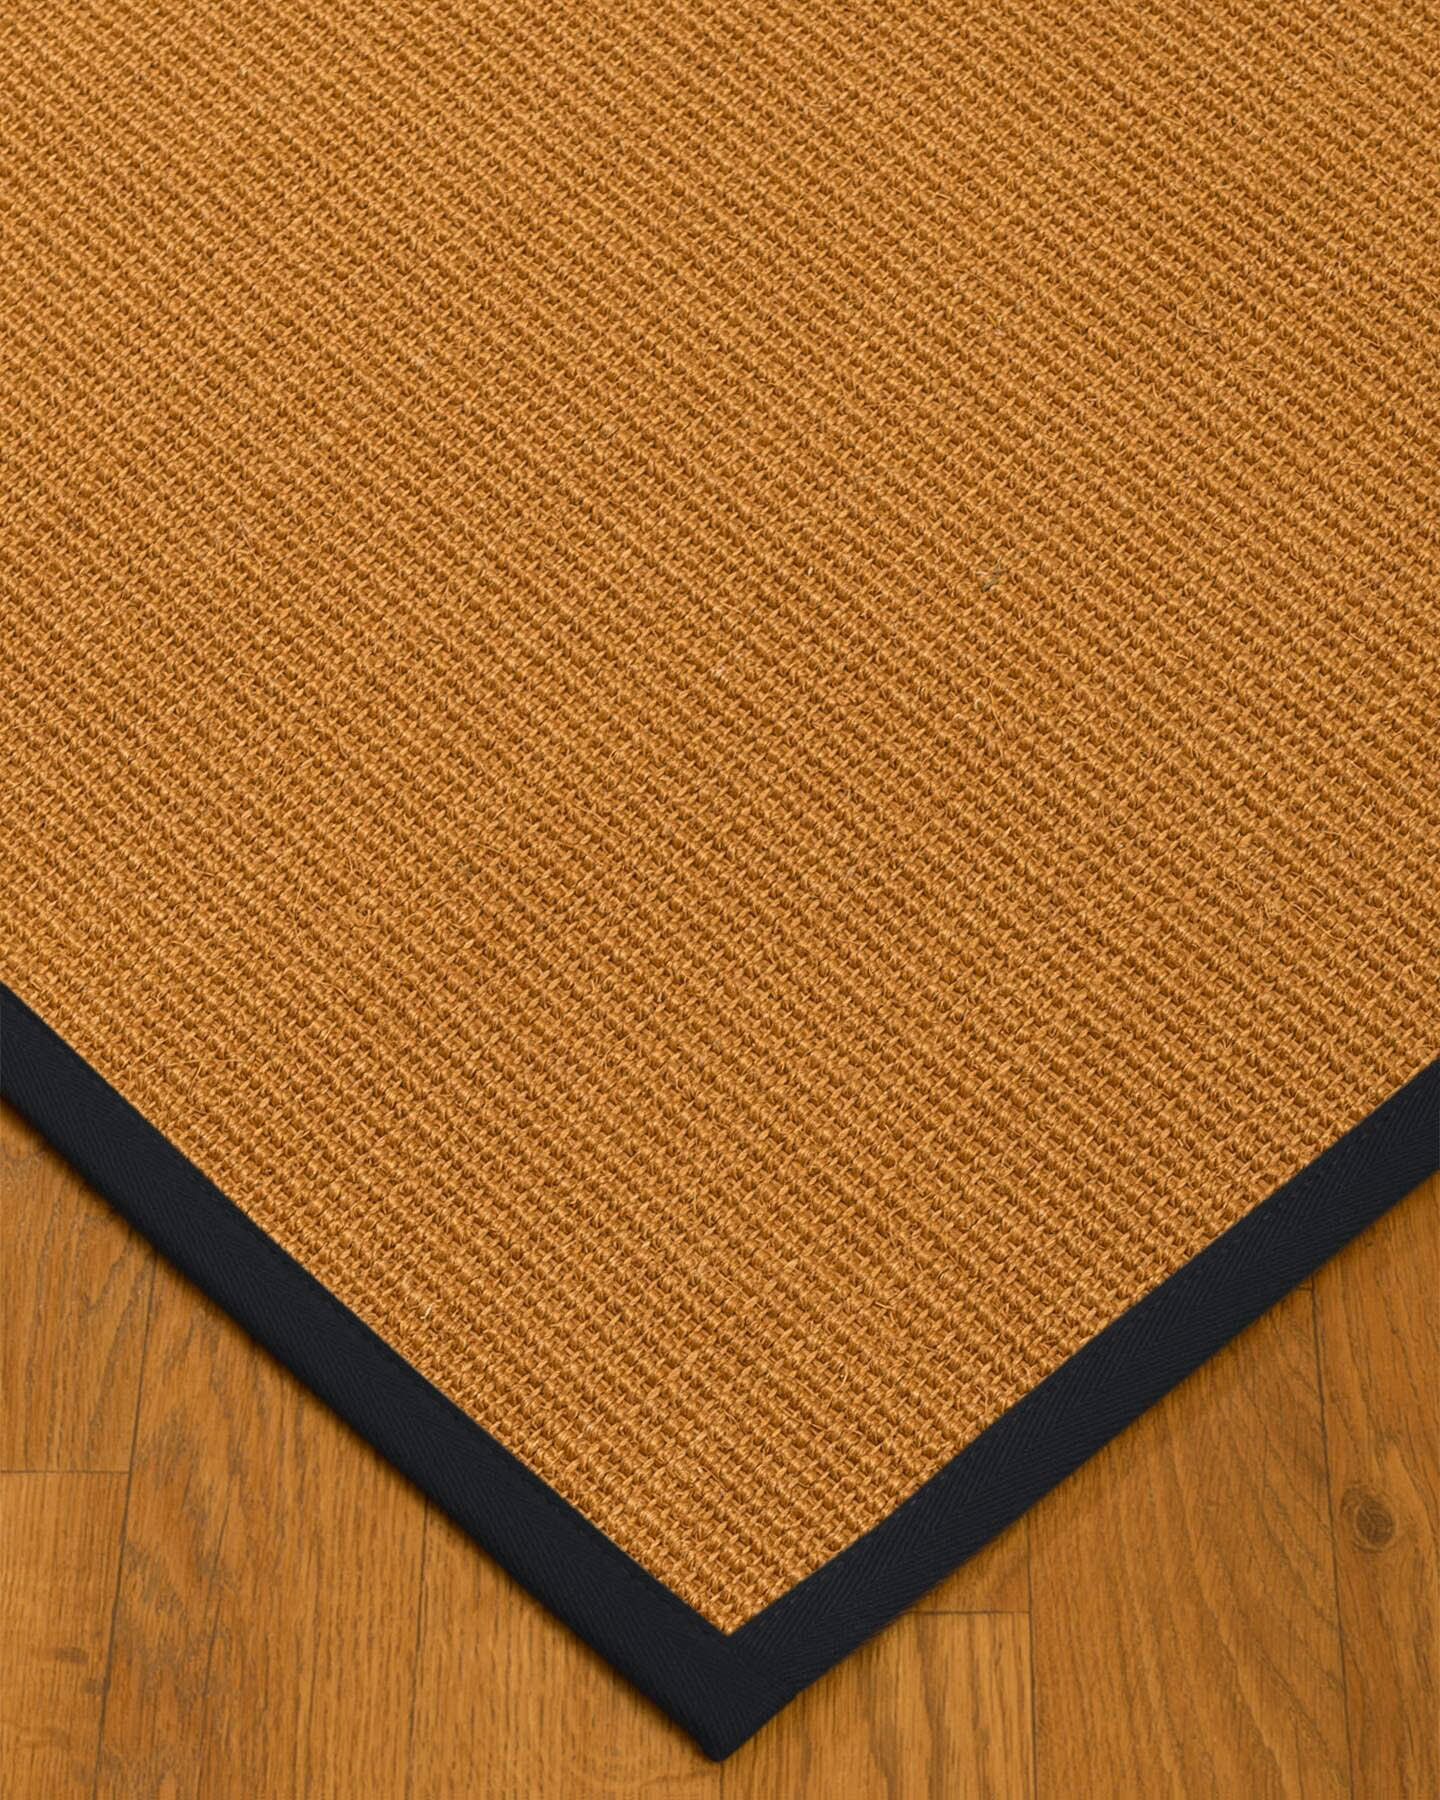 Keltner Border Hand-Woven Brown/Black Area Rug Rug Size: Rectangle 8' x 10'